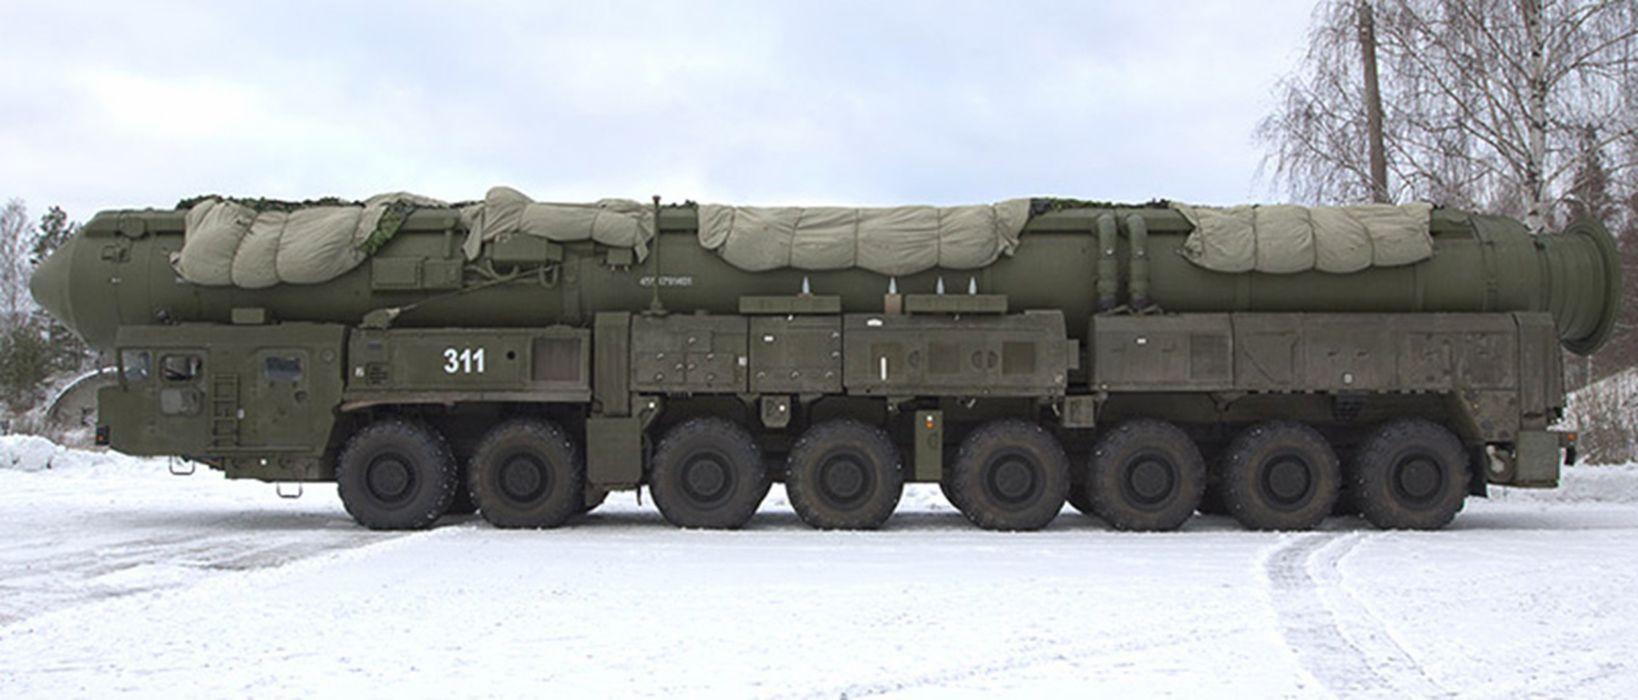 topol Russia missile russian soviet truck system mlitary IWN99 4000x1710 wallpaper